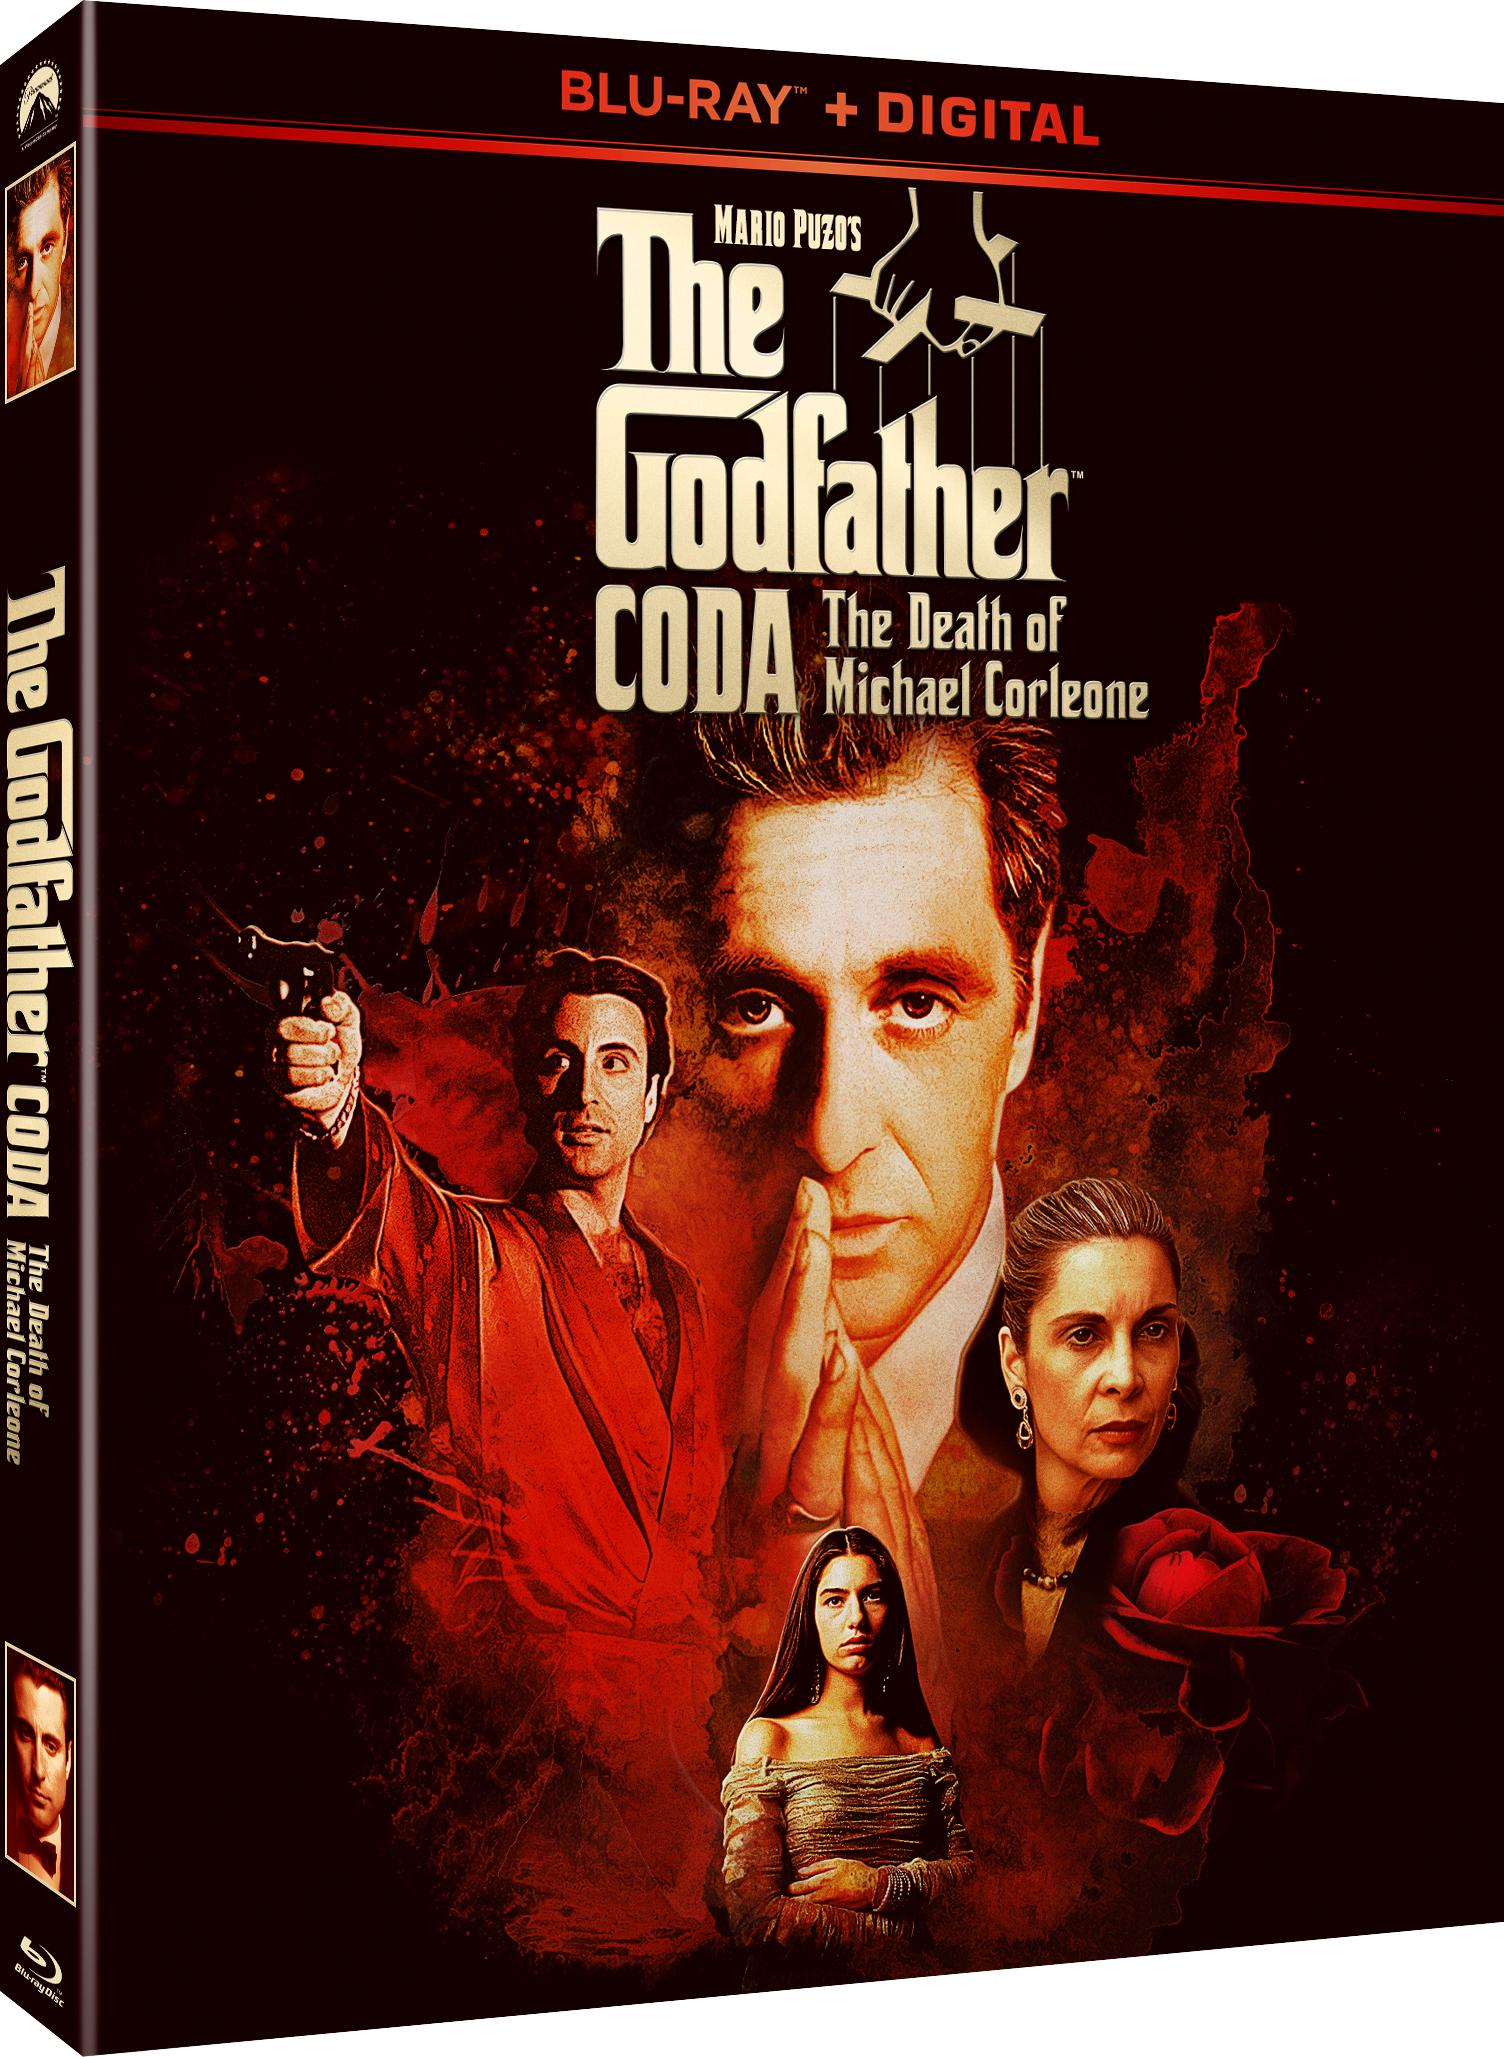 The Godfather Coda The Death Of Michael Corleone Blu Ray